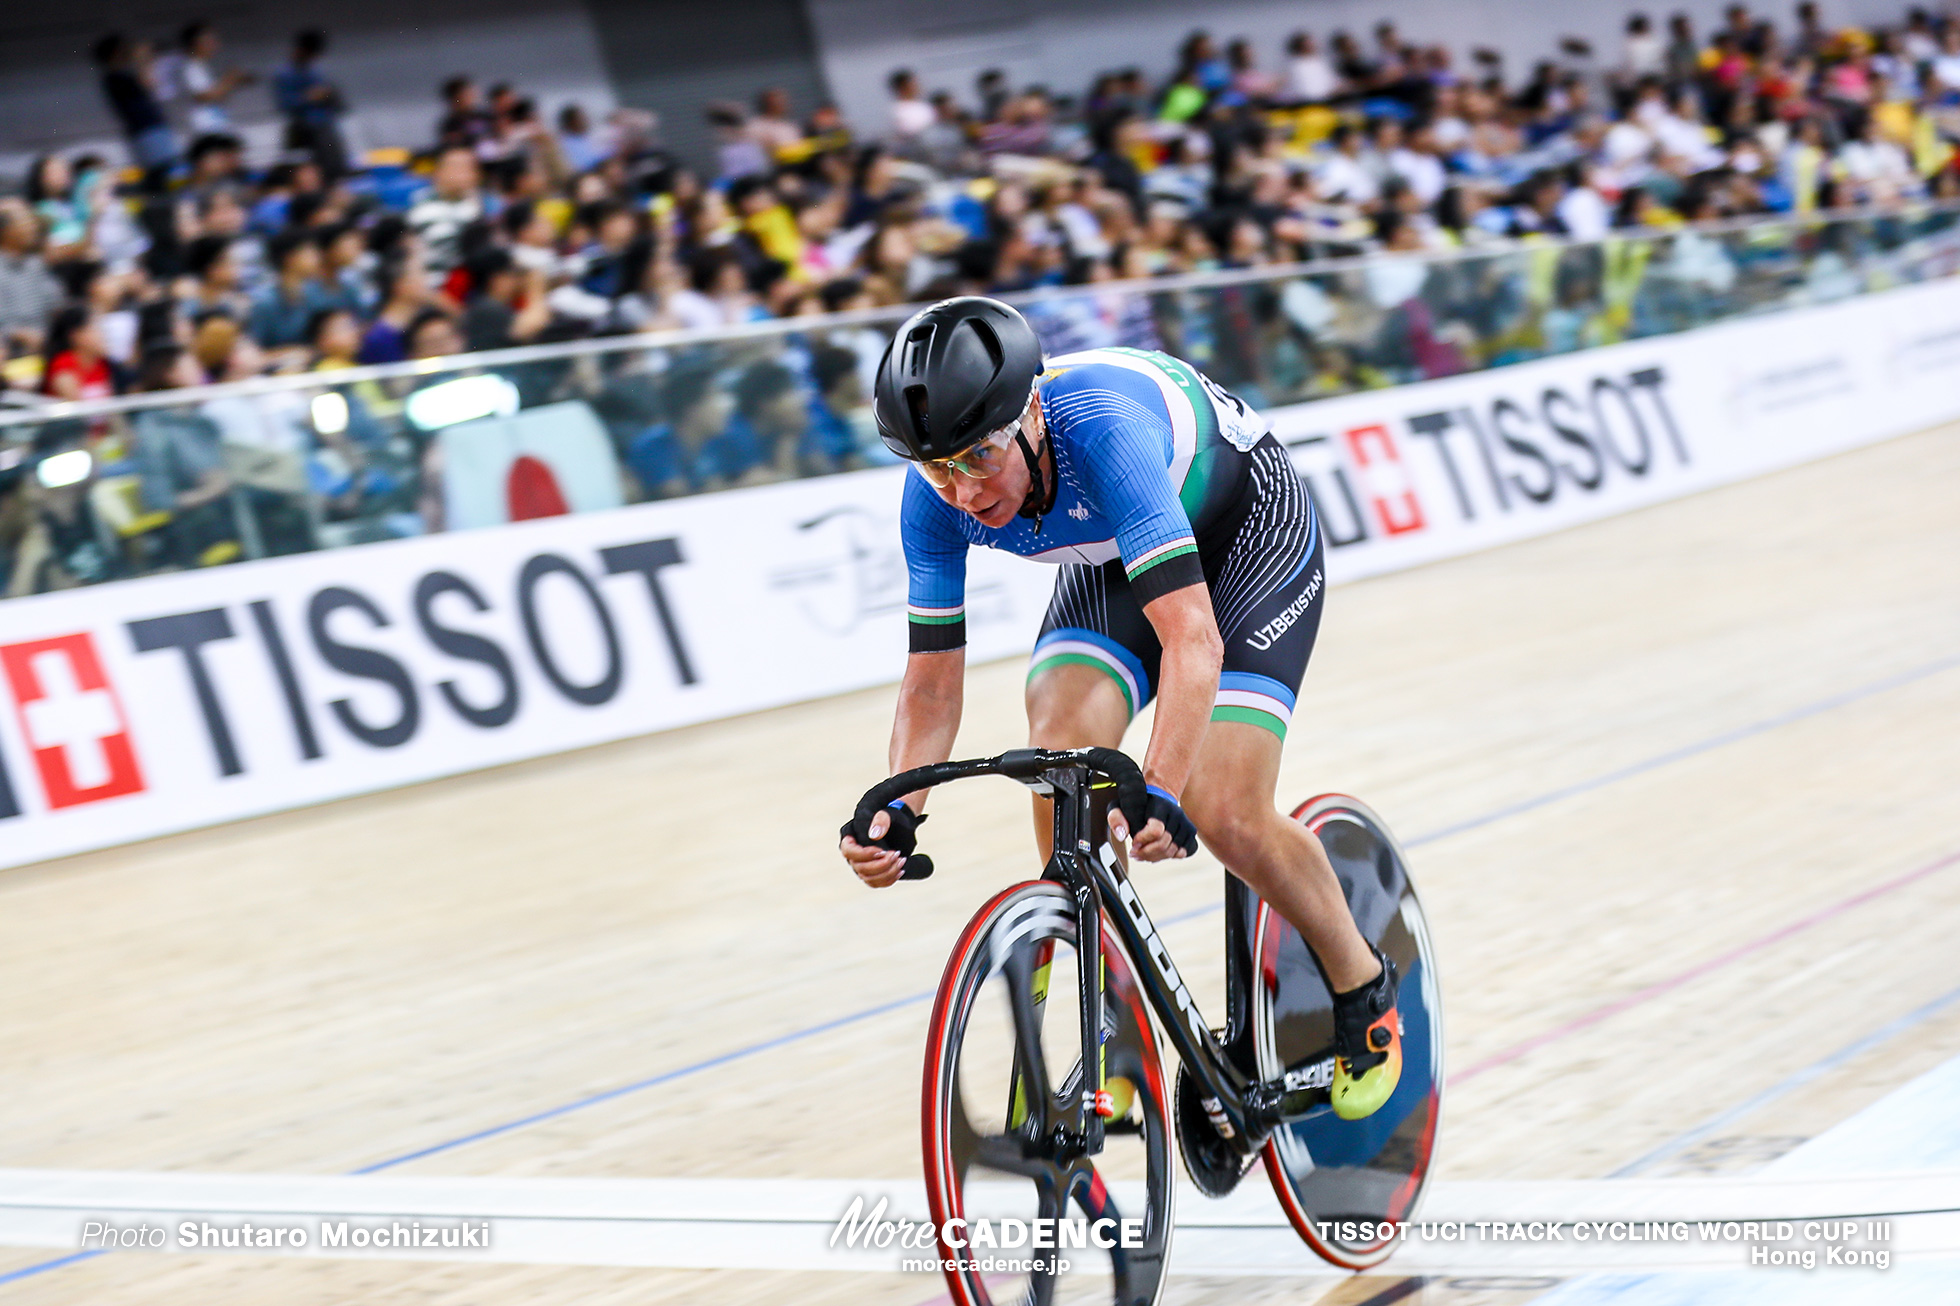 Point Race / Women's Omnium / TISSOT UCI TRACK CYCLING WORLD CUP III, Hong Kong, Olga ZABELINSKAYA オルガ・ザベリンスカヤ